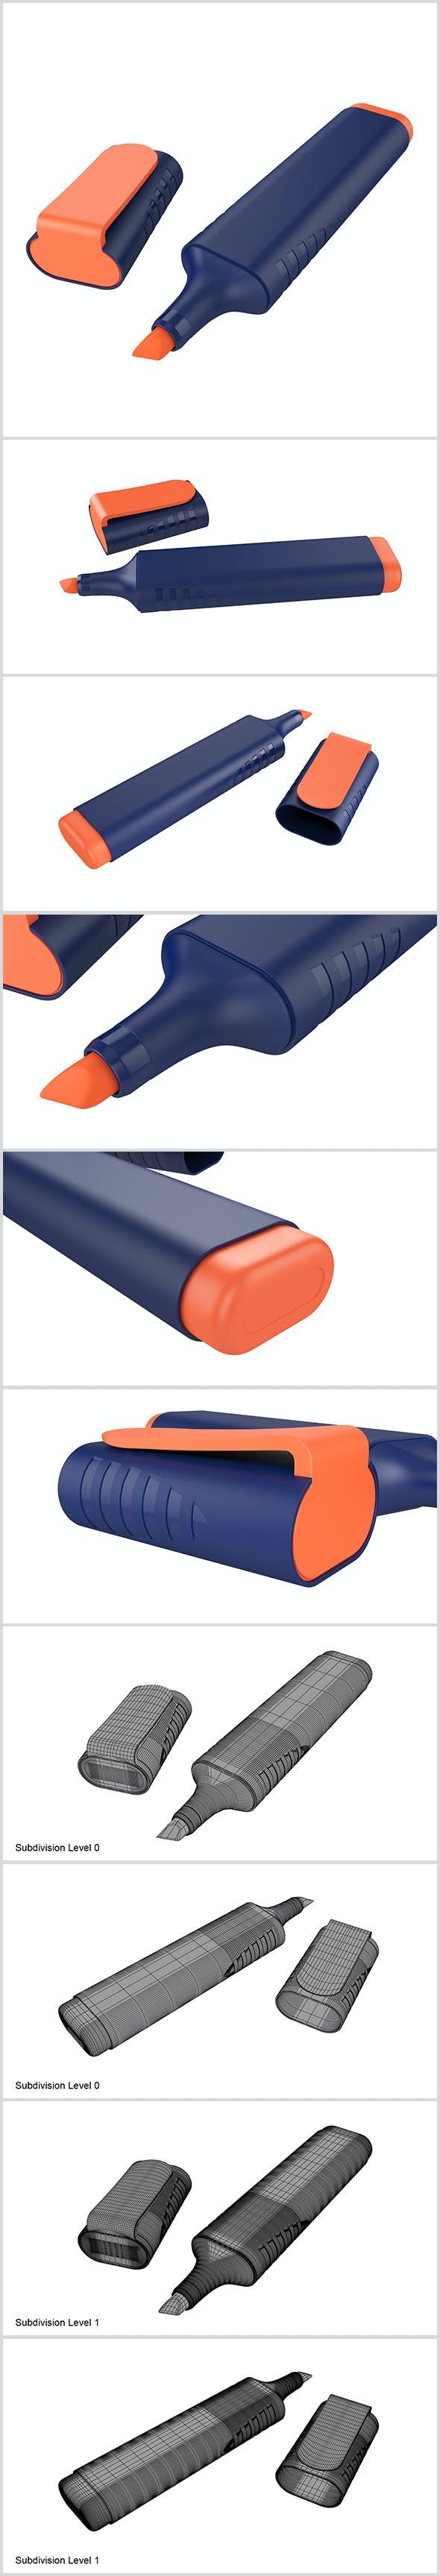 Highlighter Pen - 3DOcean Item for Sale